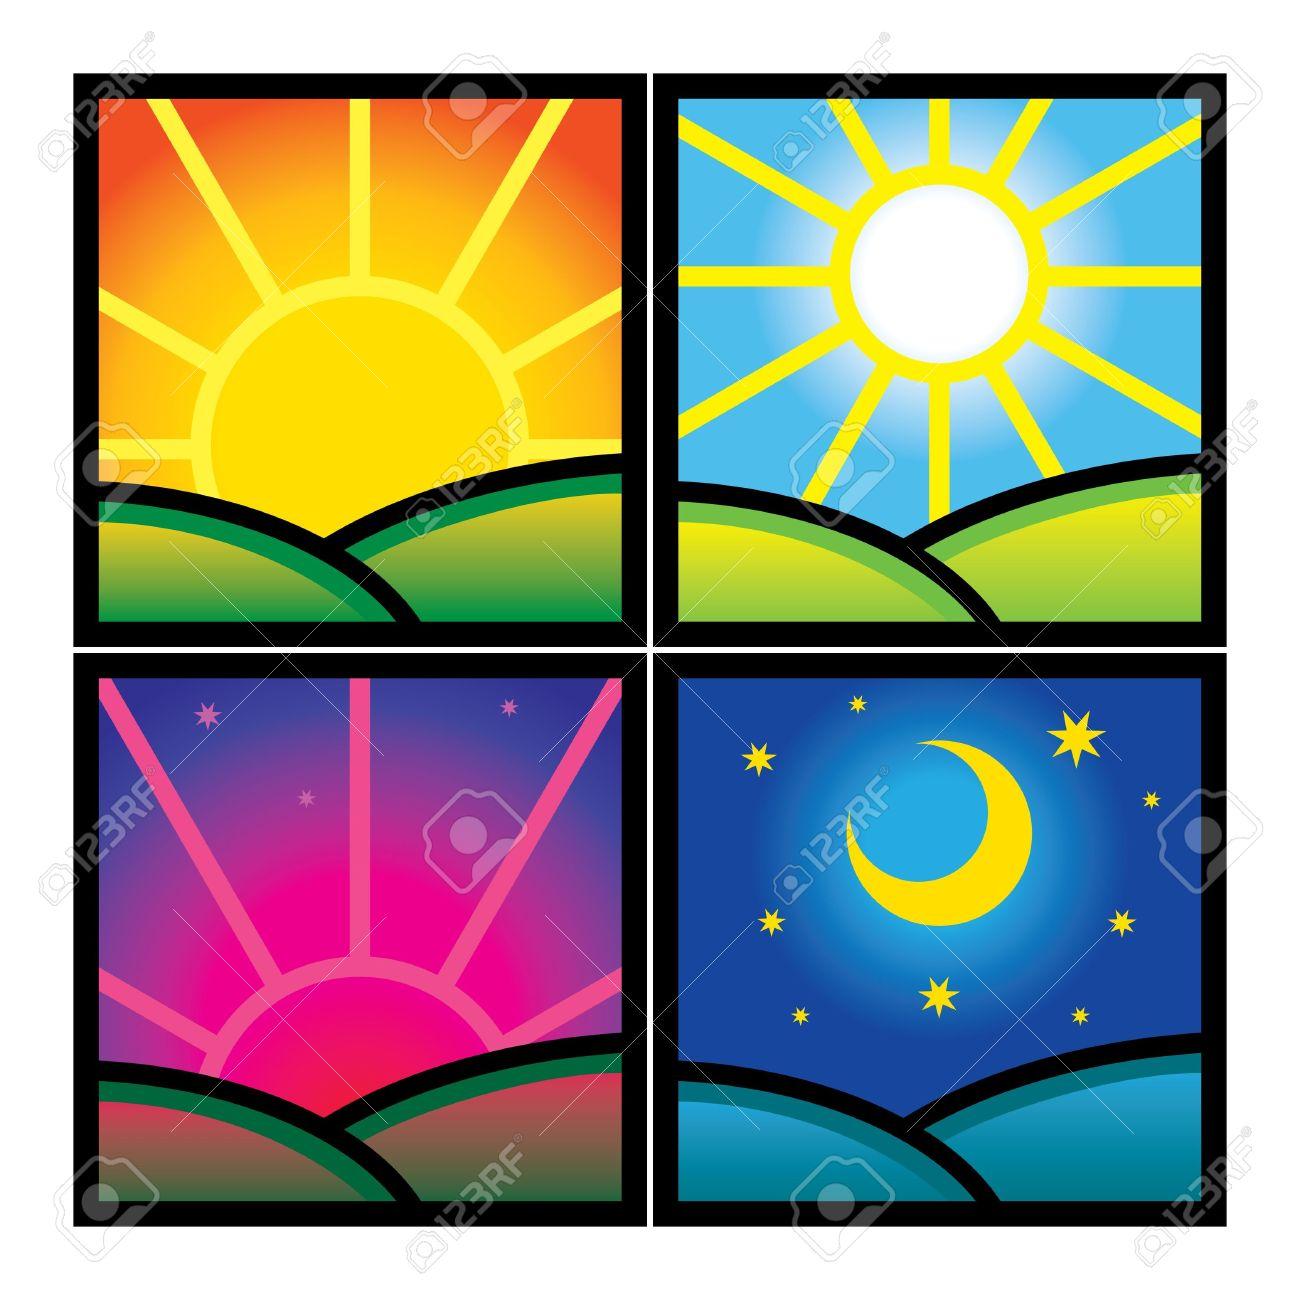 1300x1300 Sunrise Clipart Morning Time